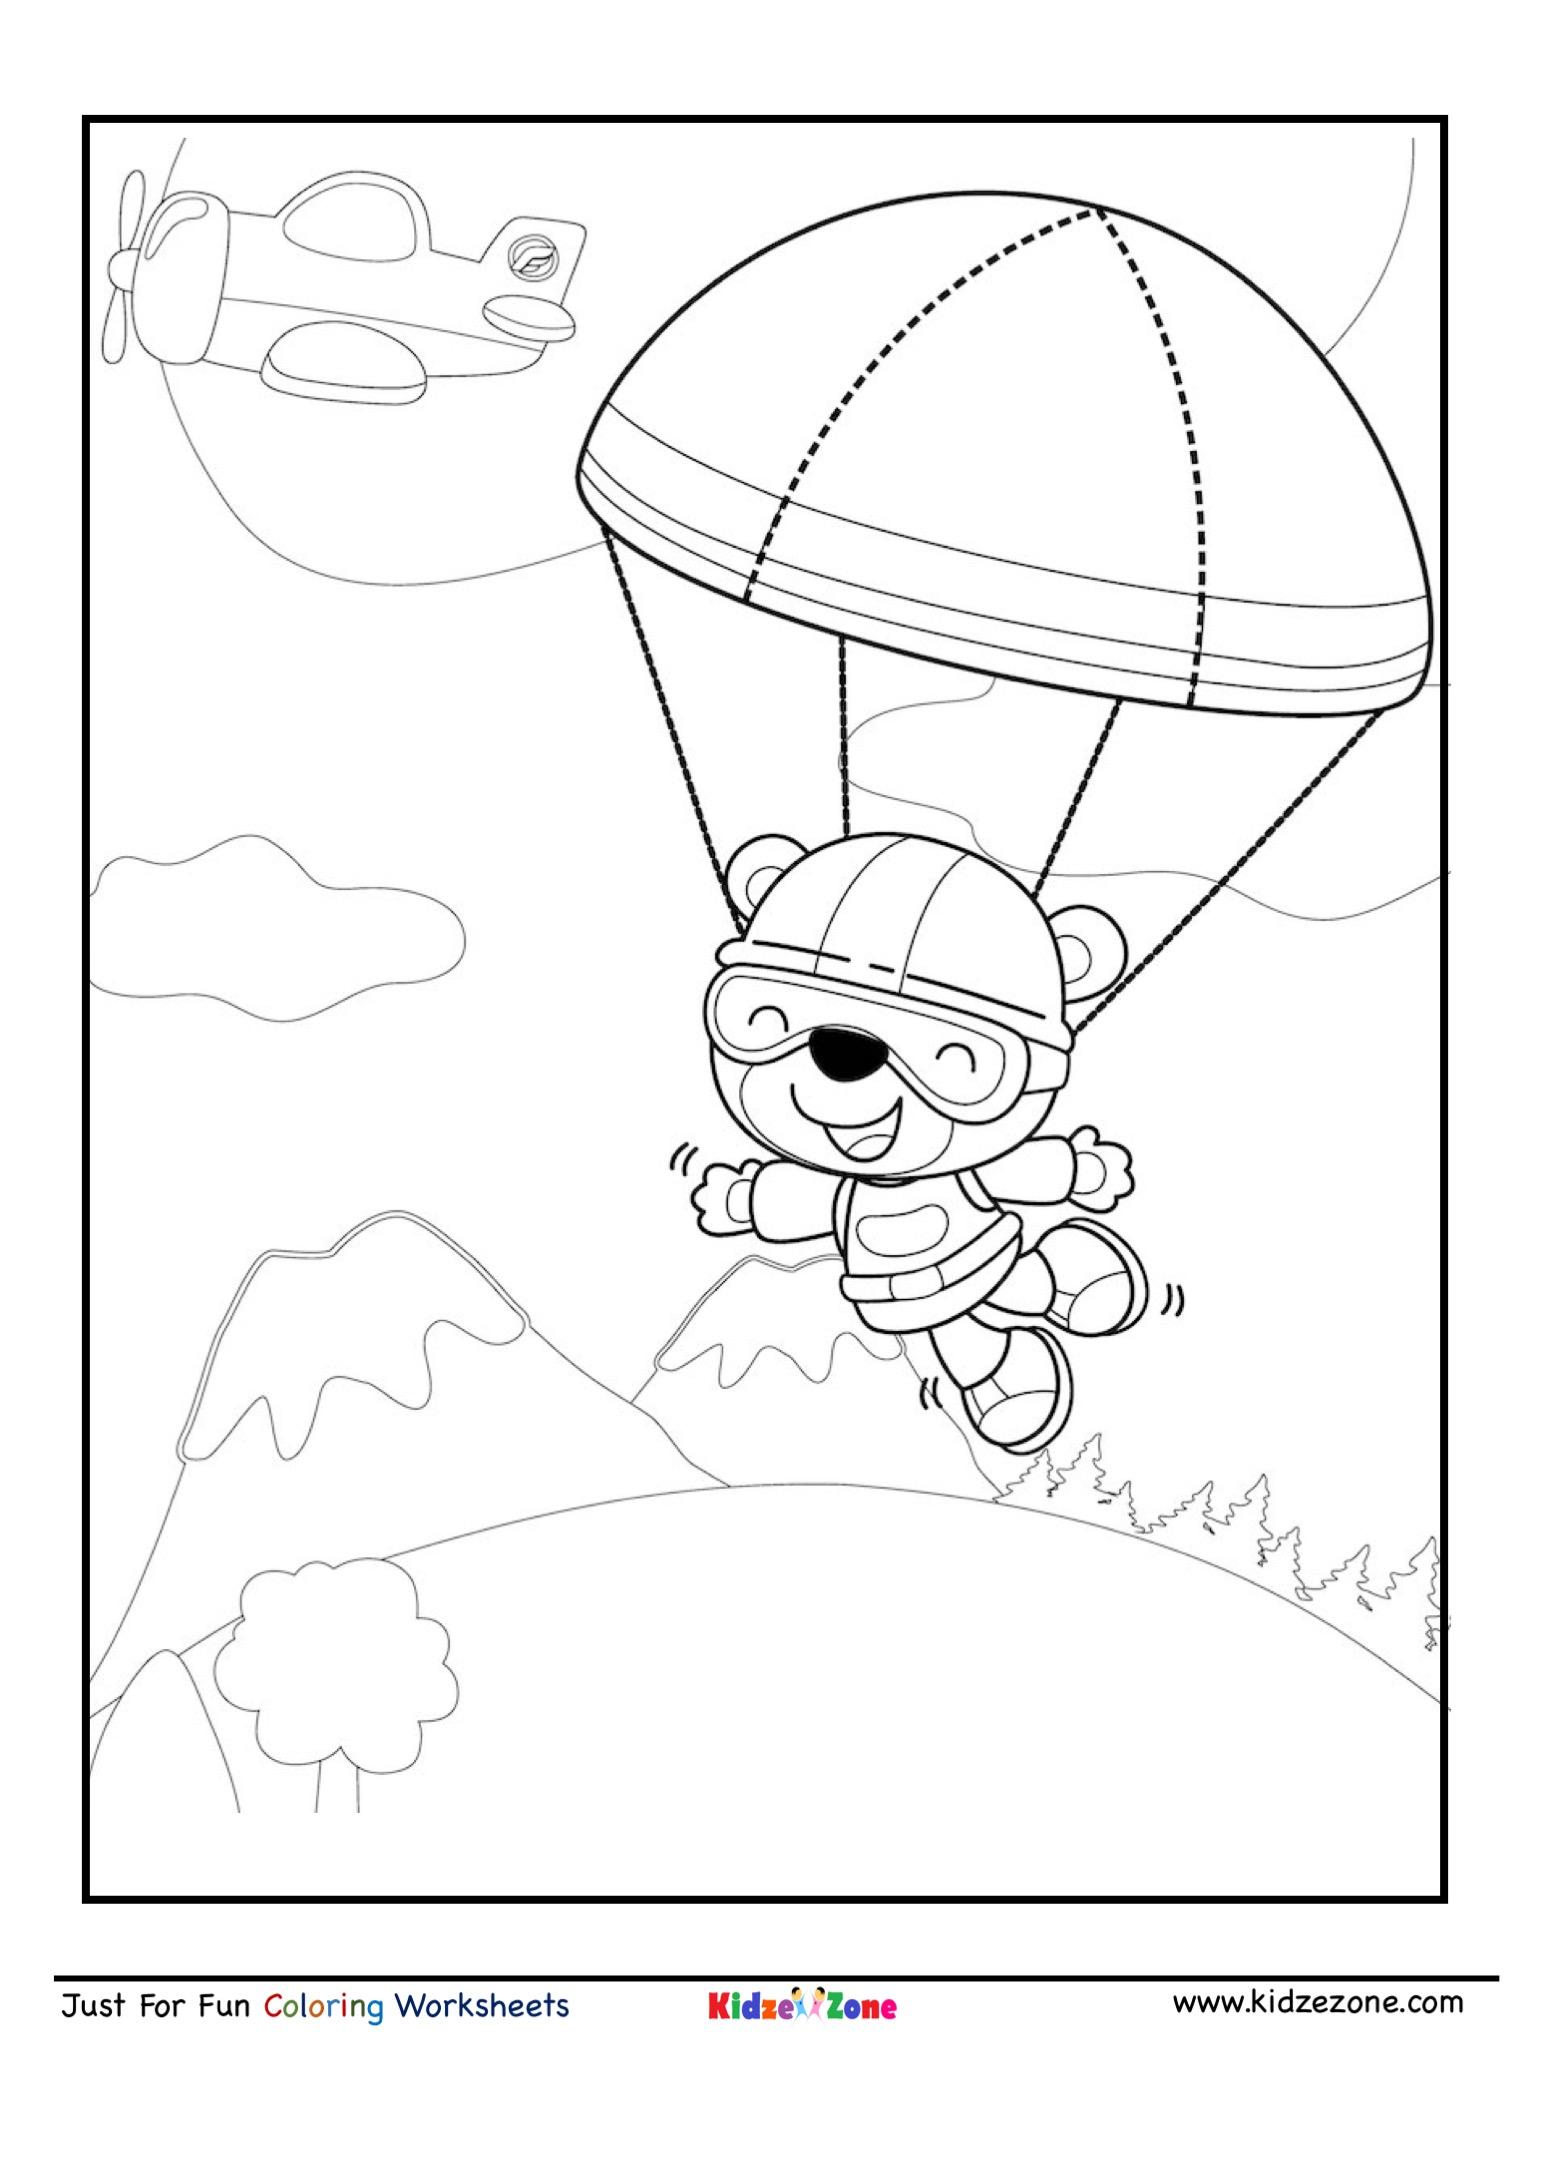 Sky Diving Bear Cartoon Coloring Page